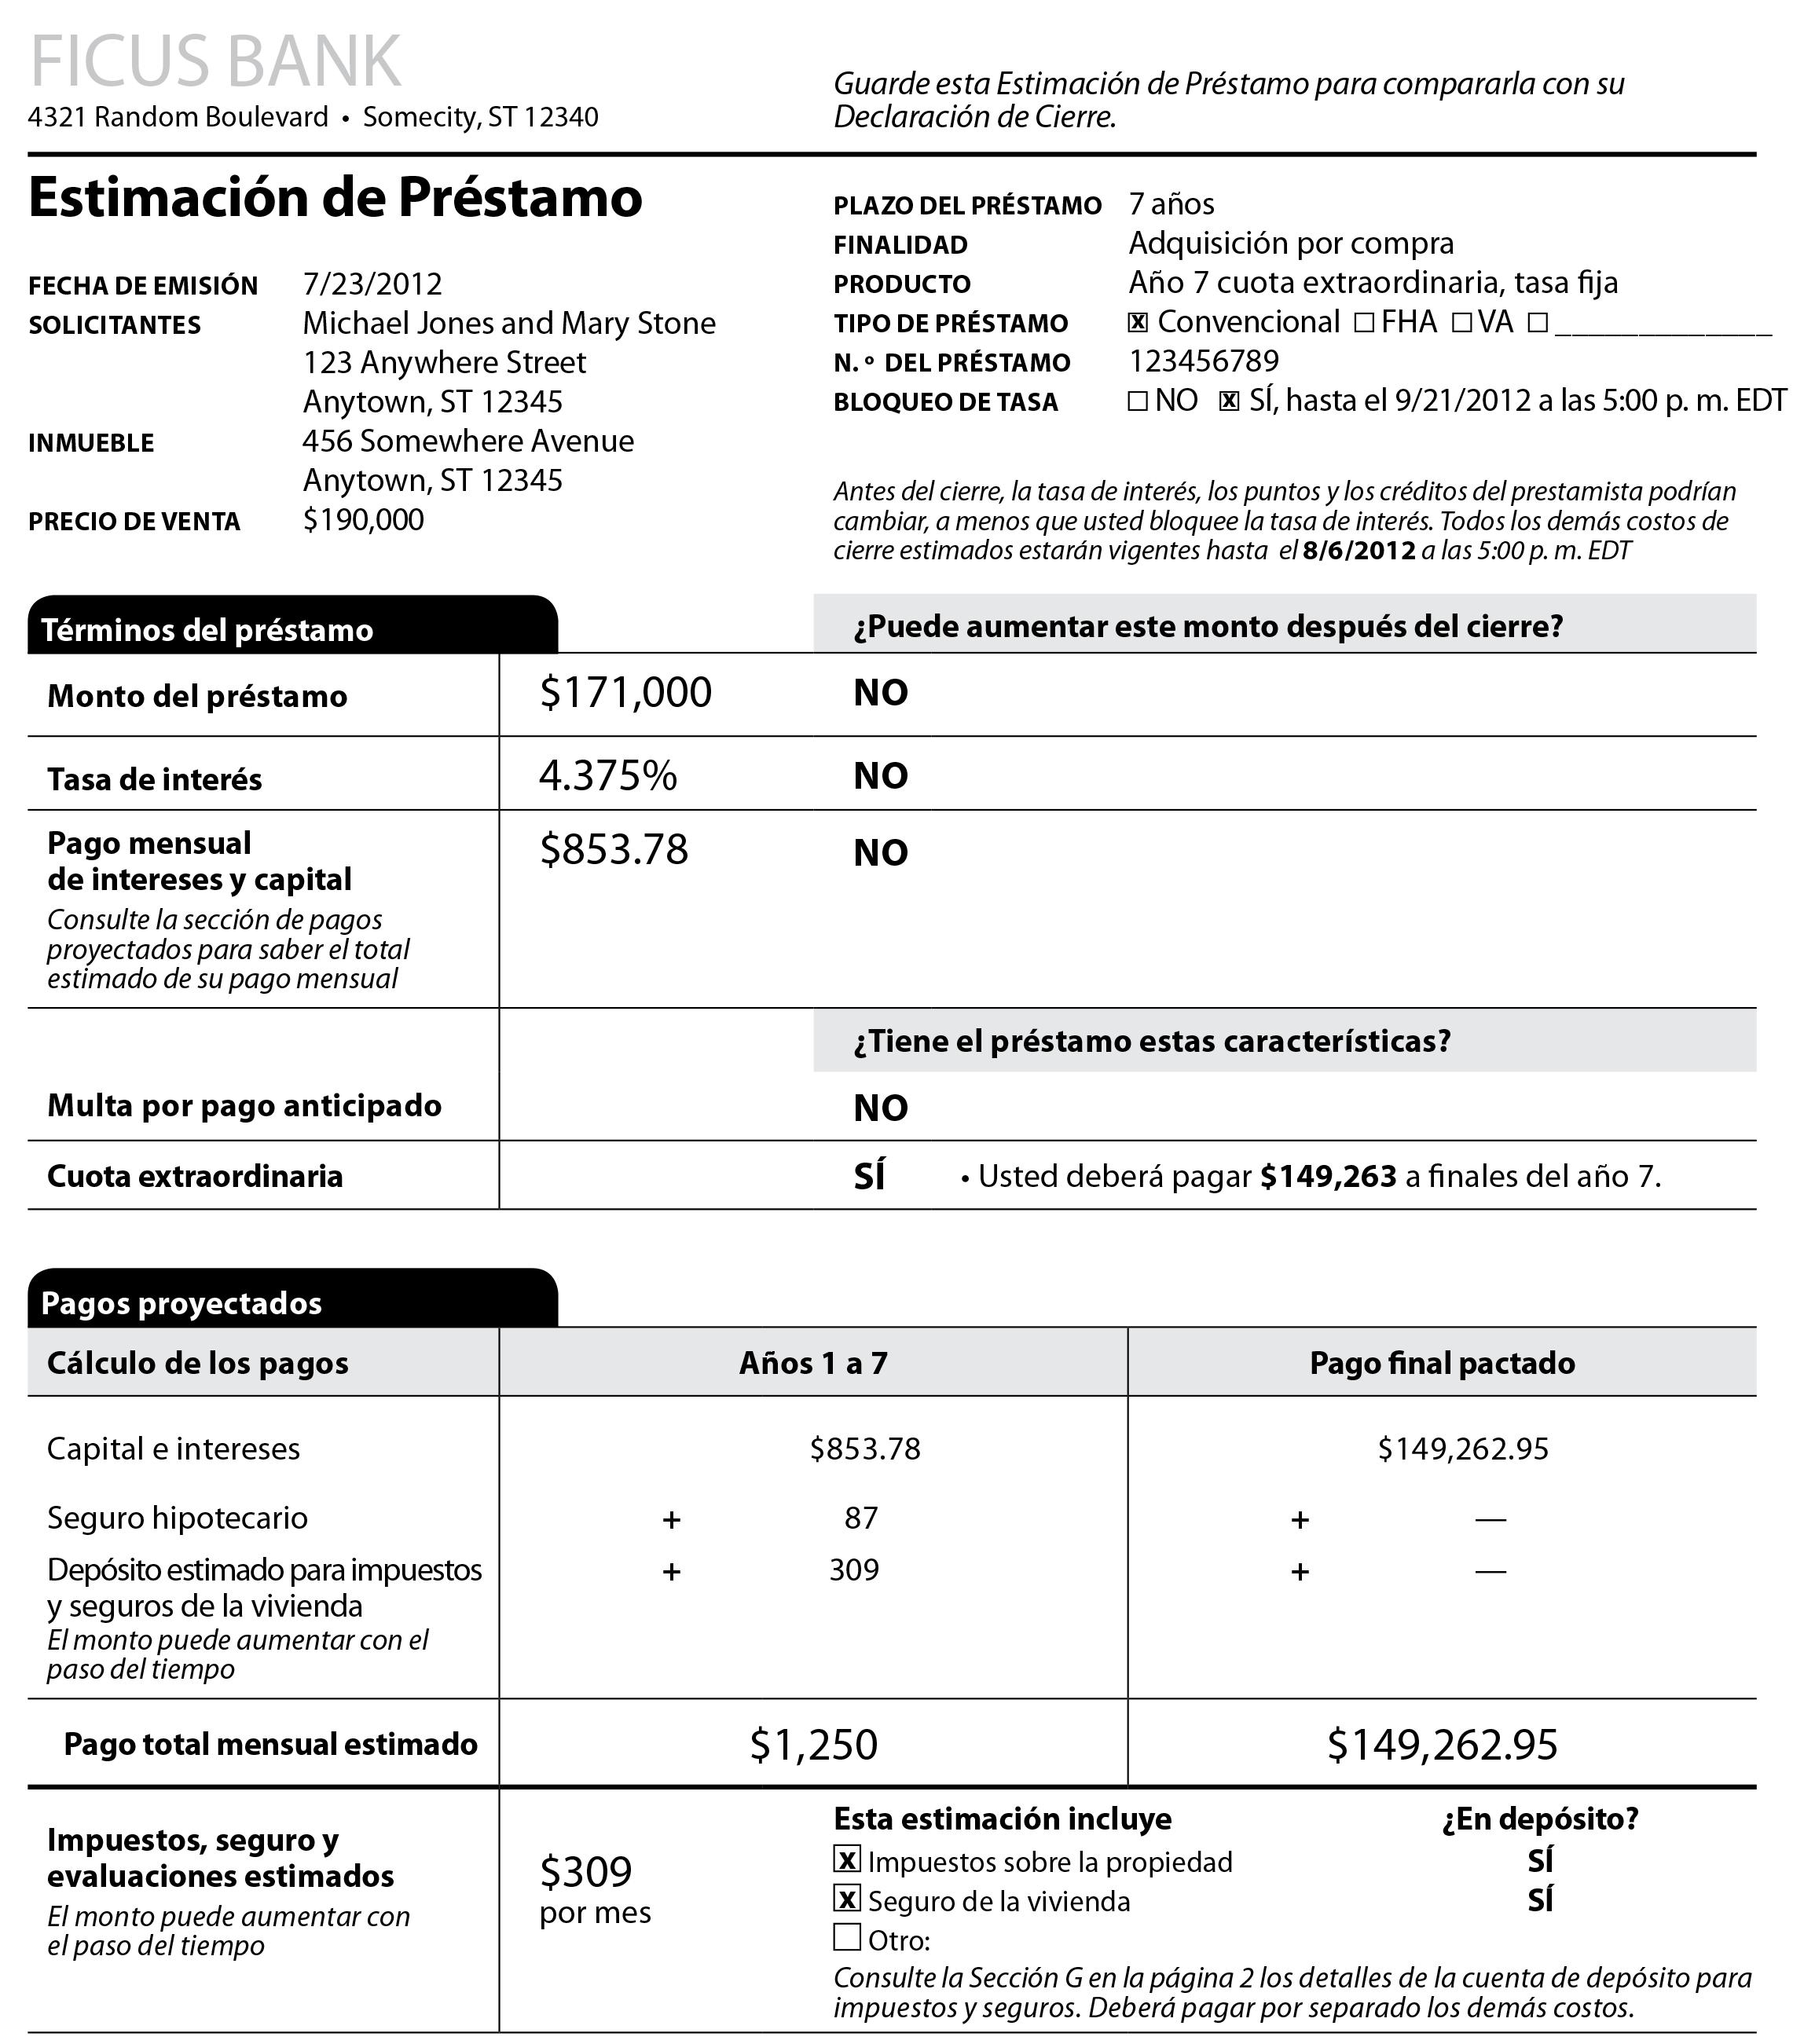 balloon mortgage  balloon mortgage form